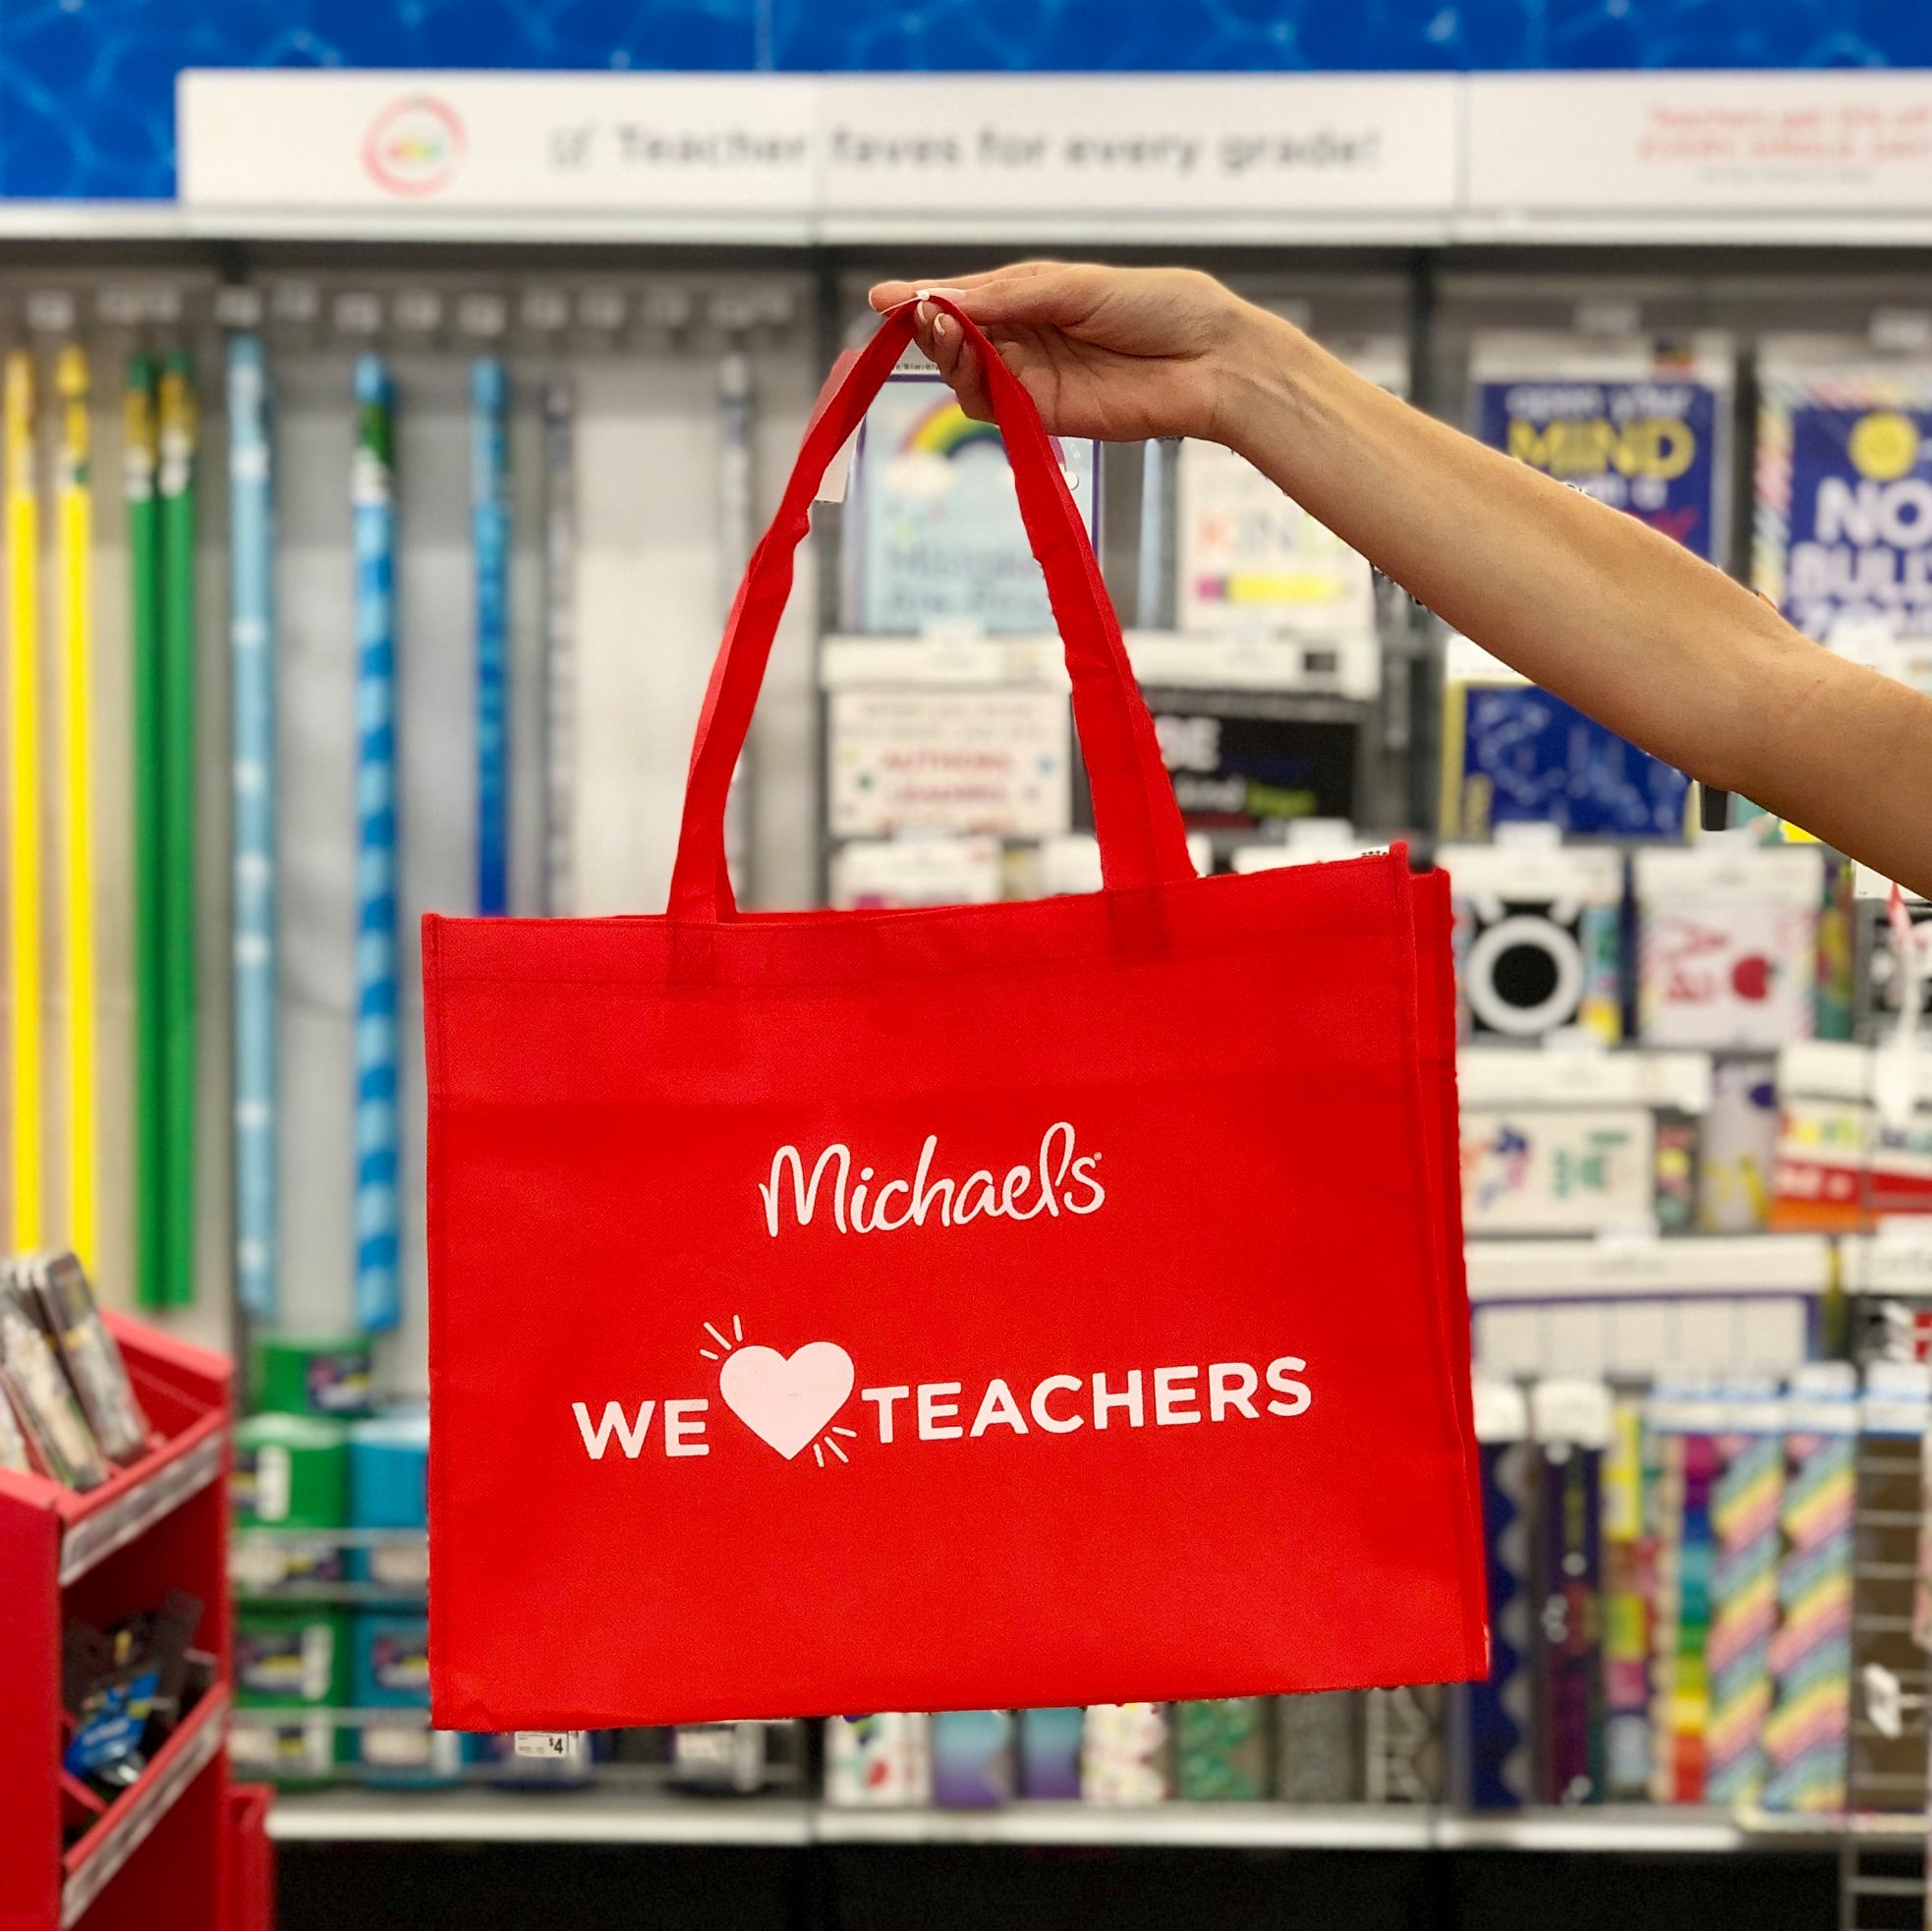 michaels teacher rewards